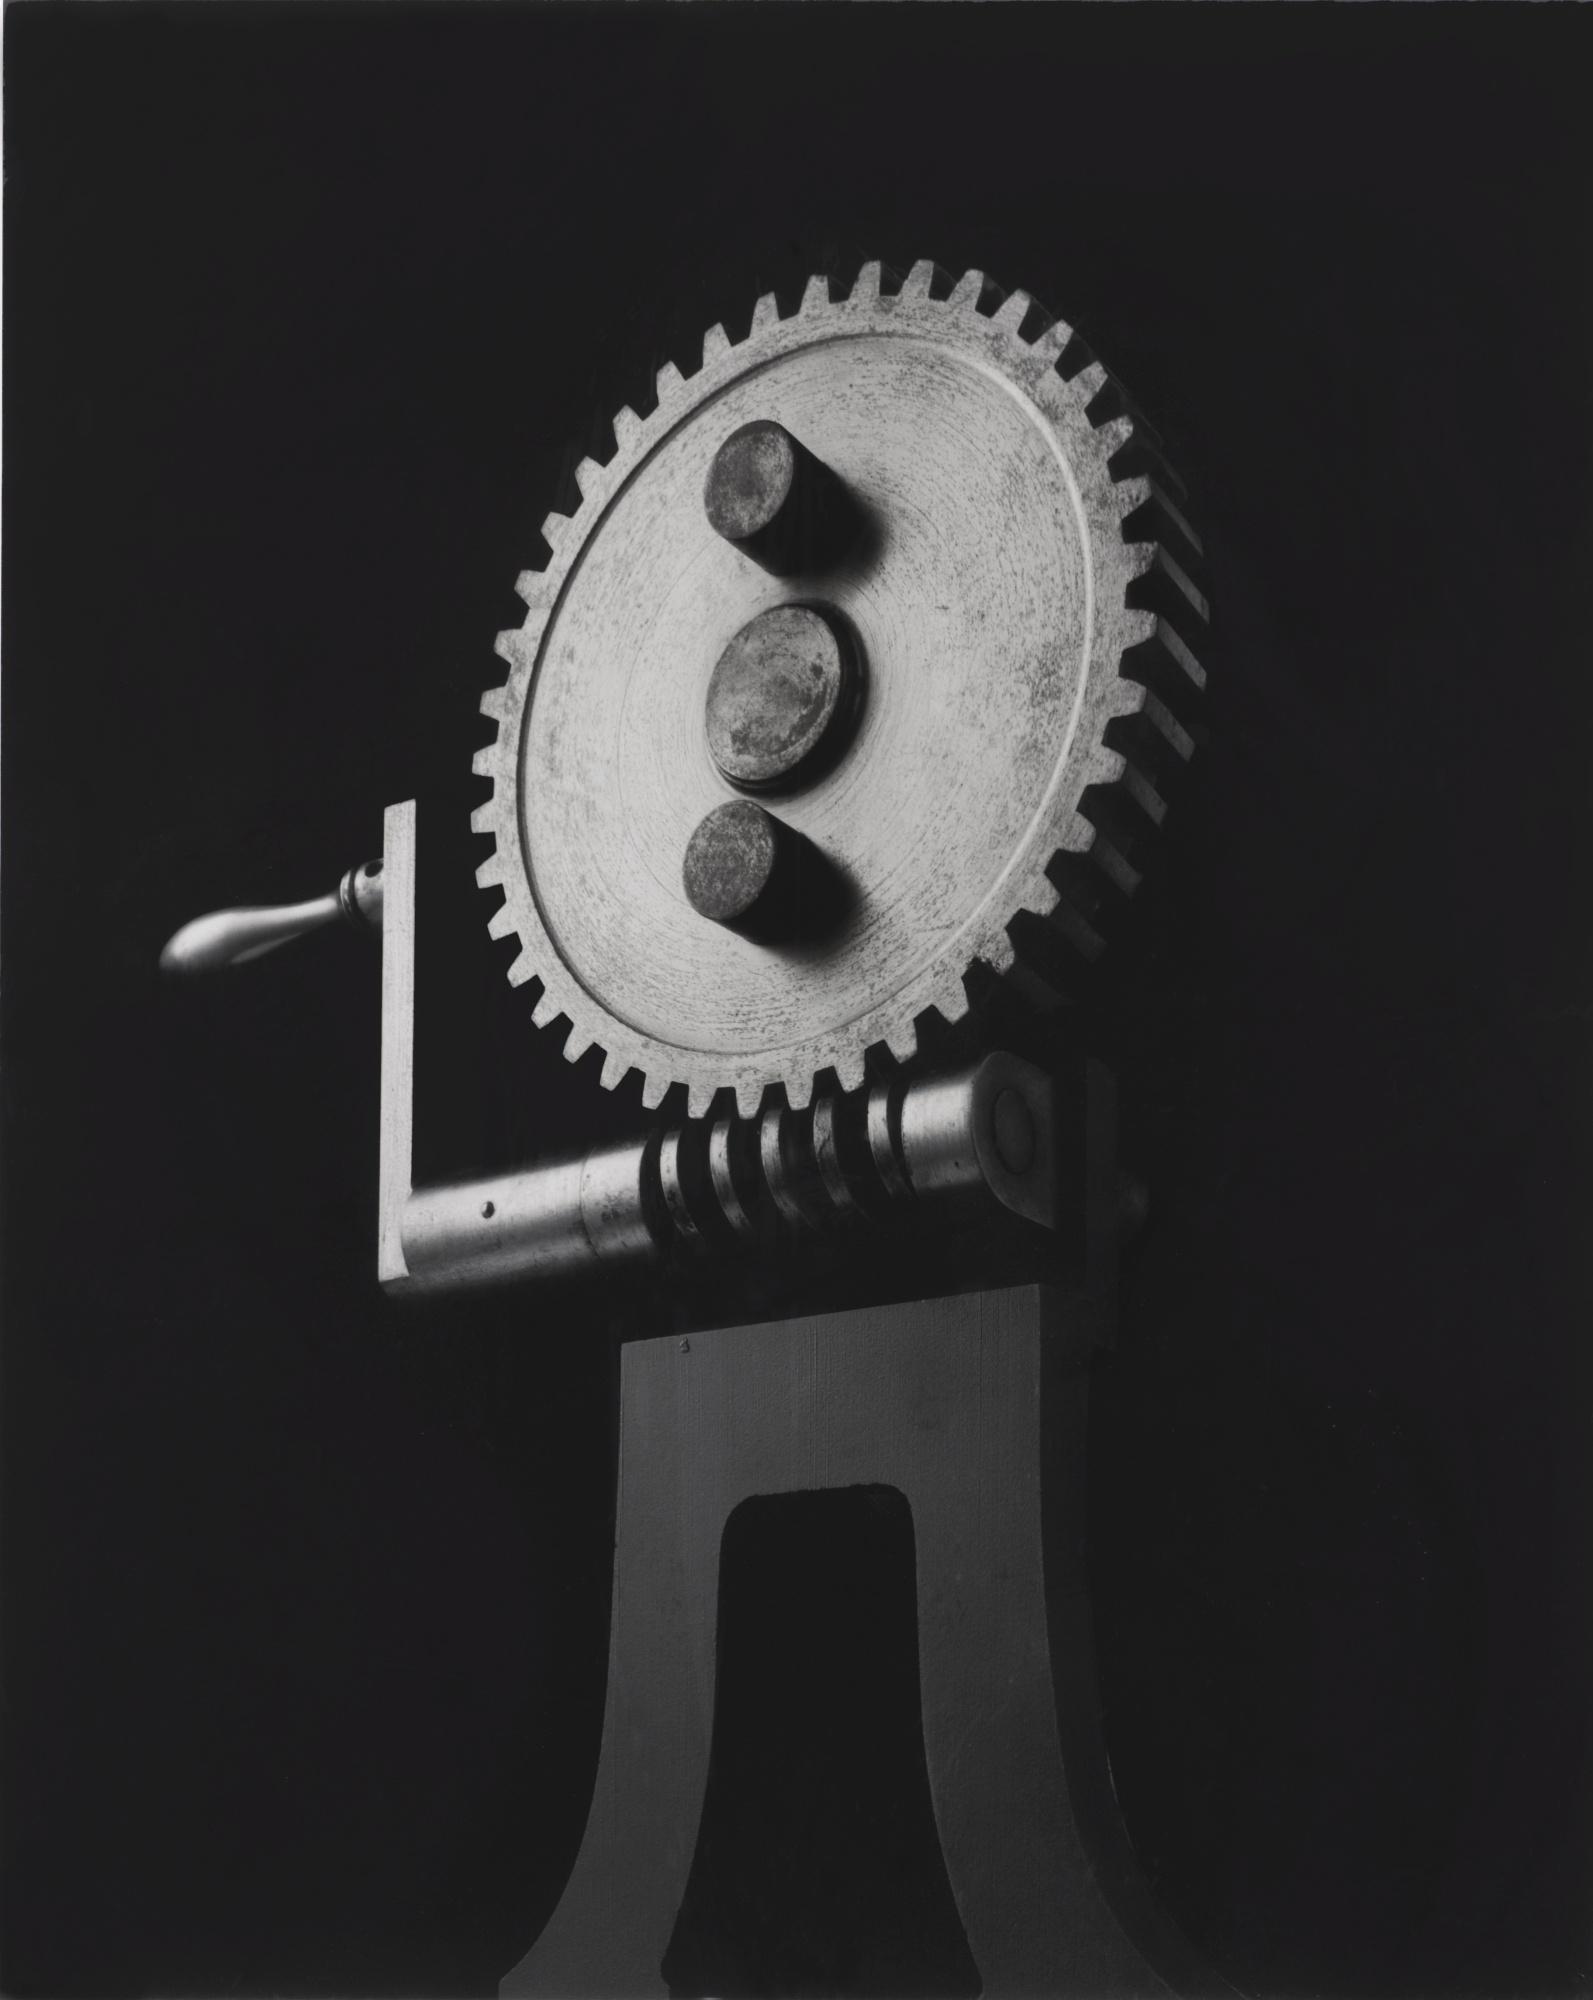 Hiroshi Sugimoto-Conceptual Form 0026-2004